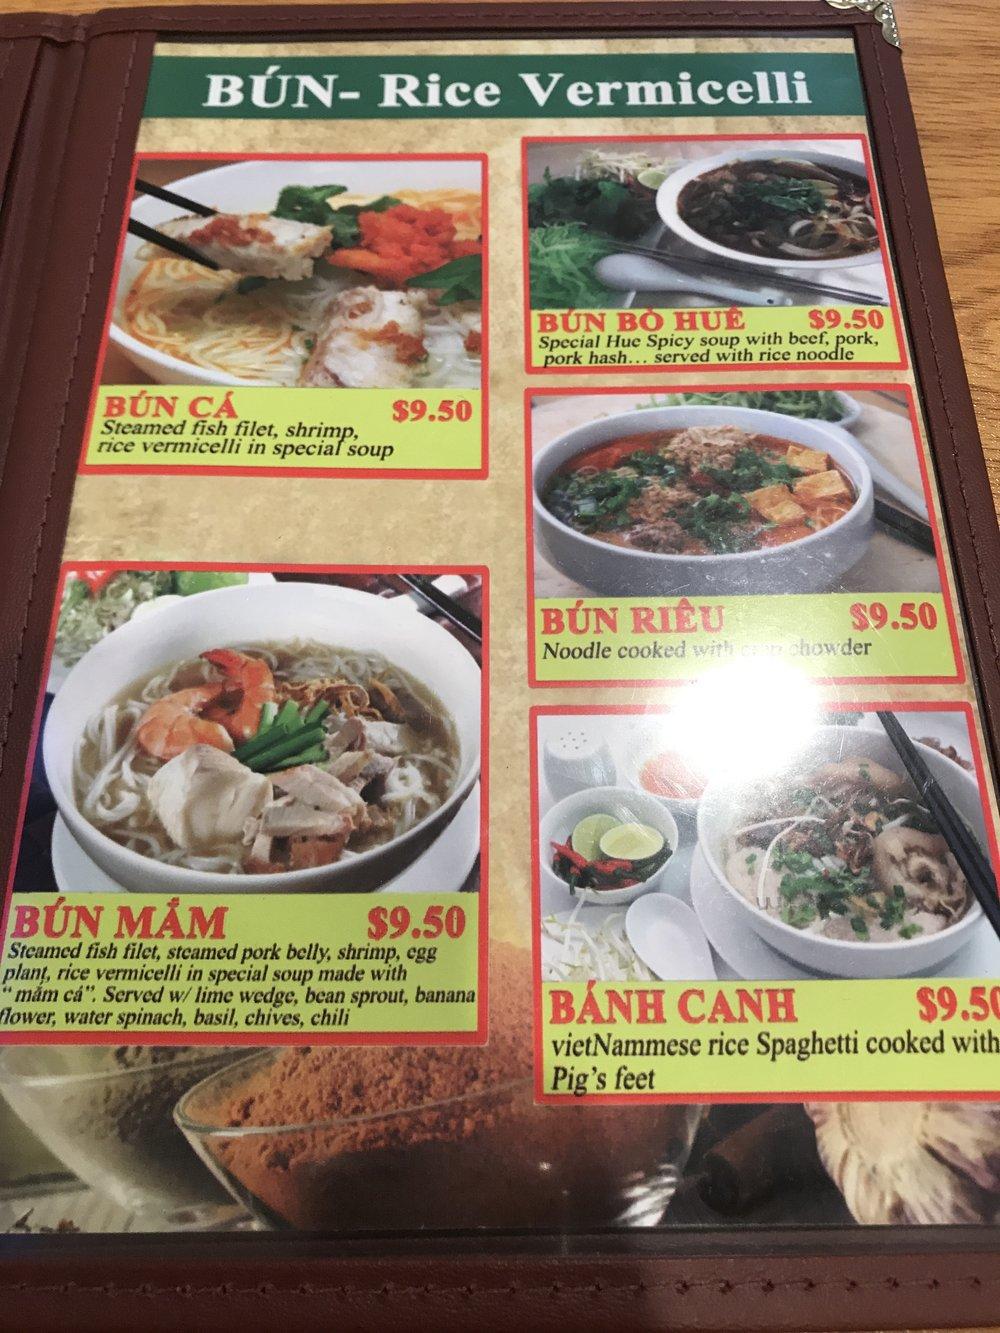 Kien Giang Quan's Rice & Rice Vermicelli Menu